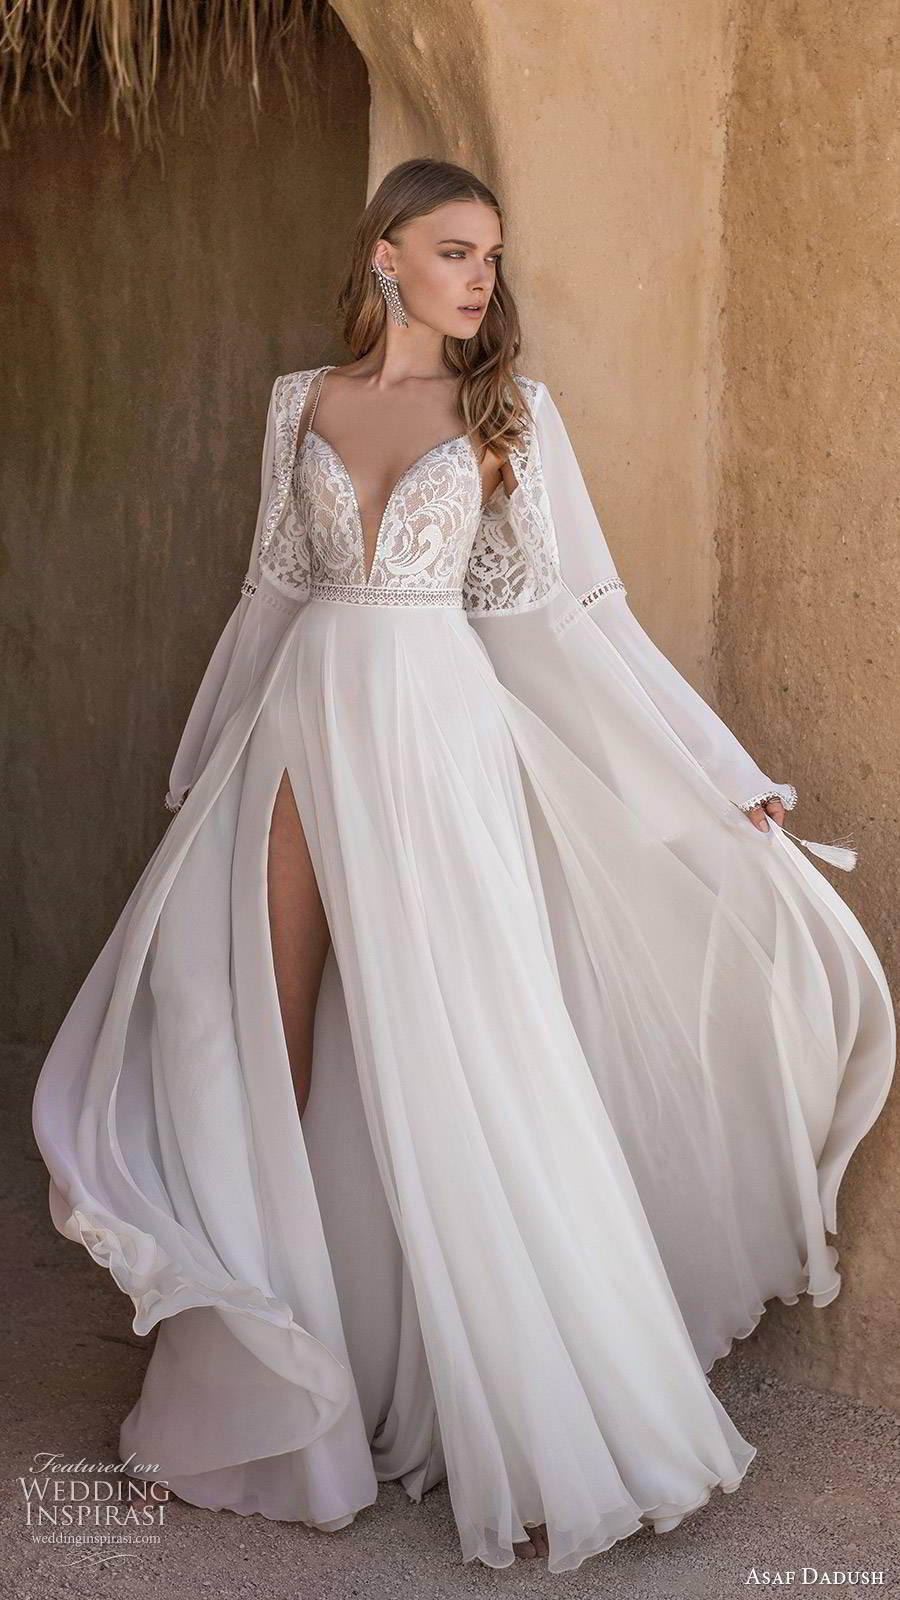 asaf dadush 2019 bridal sleeveless thin straps plunging v neckline embellished bodice slit skirt sexy a line wedding dress jacket (6) mv